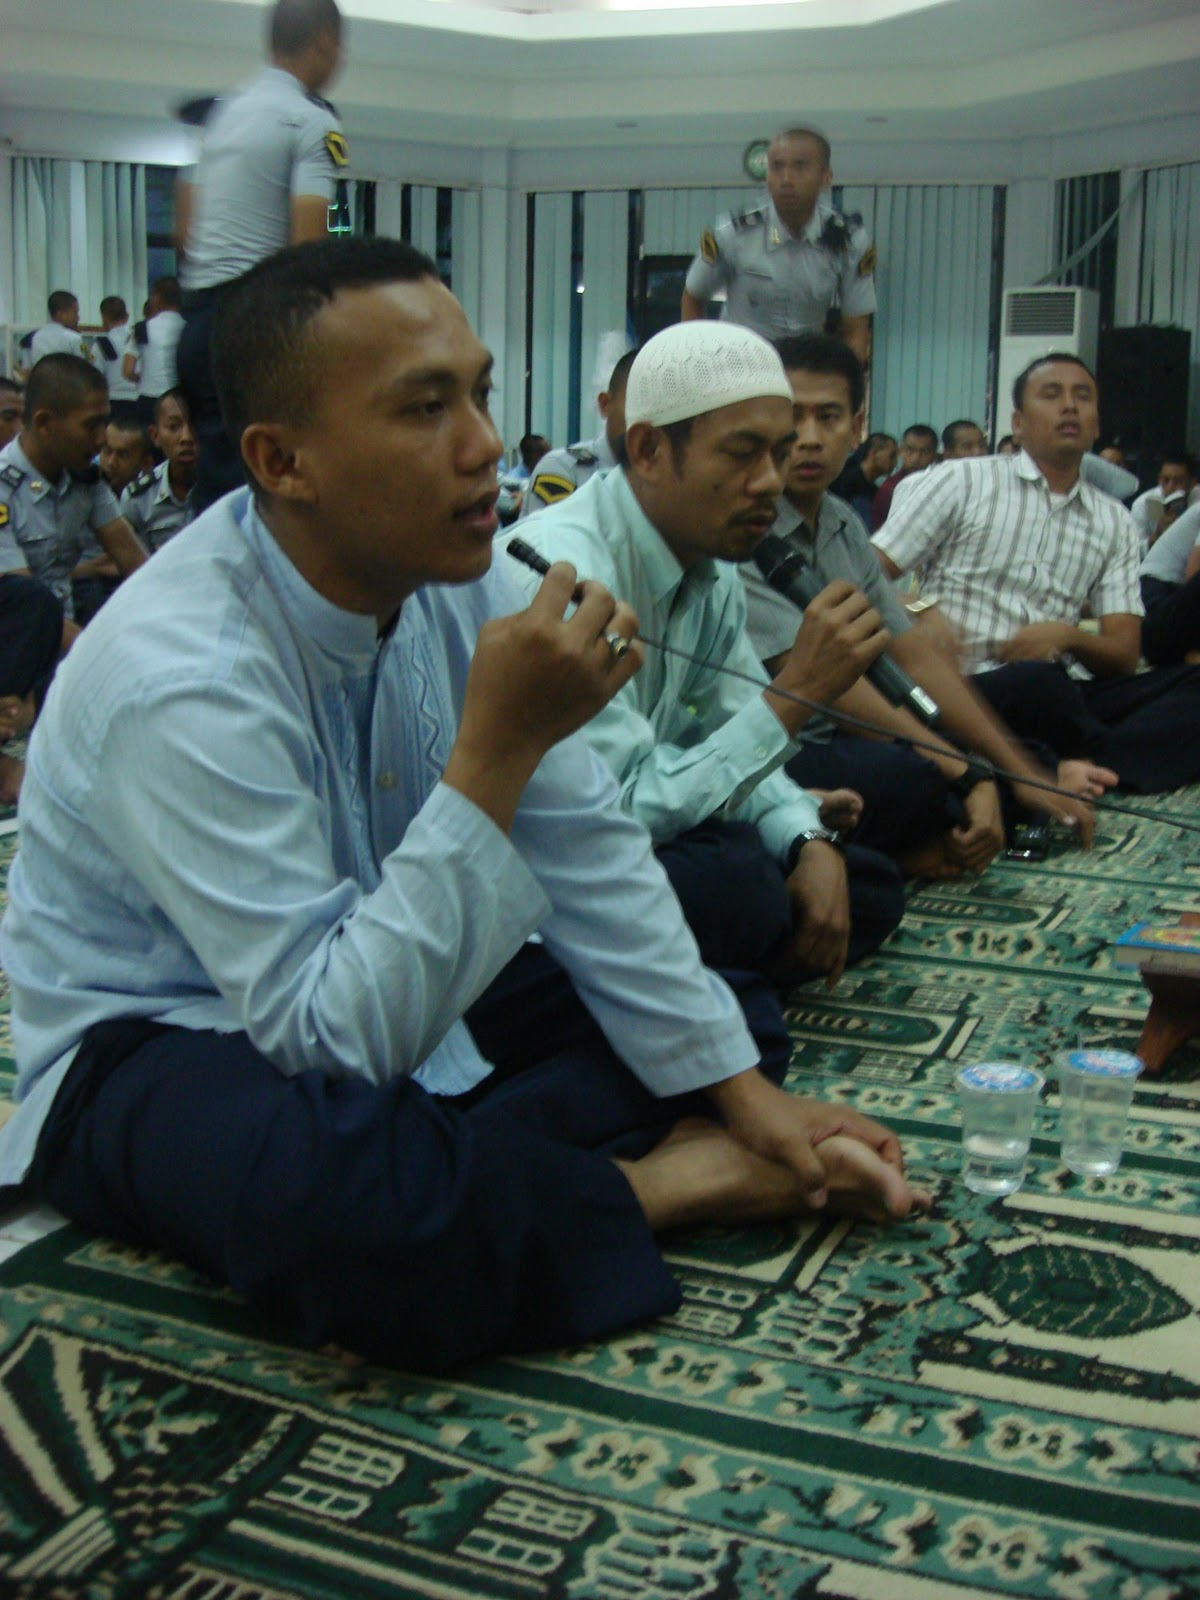 acara dilanjutkan dengan pembacaan do'a Qotmil Qur'an dan Pembacaan Do